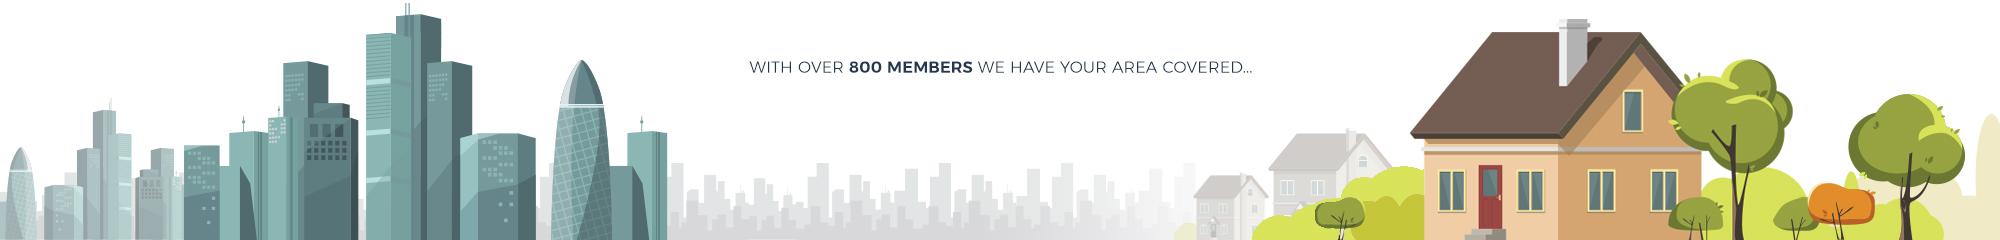 members_header_image